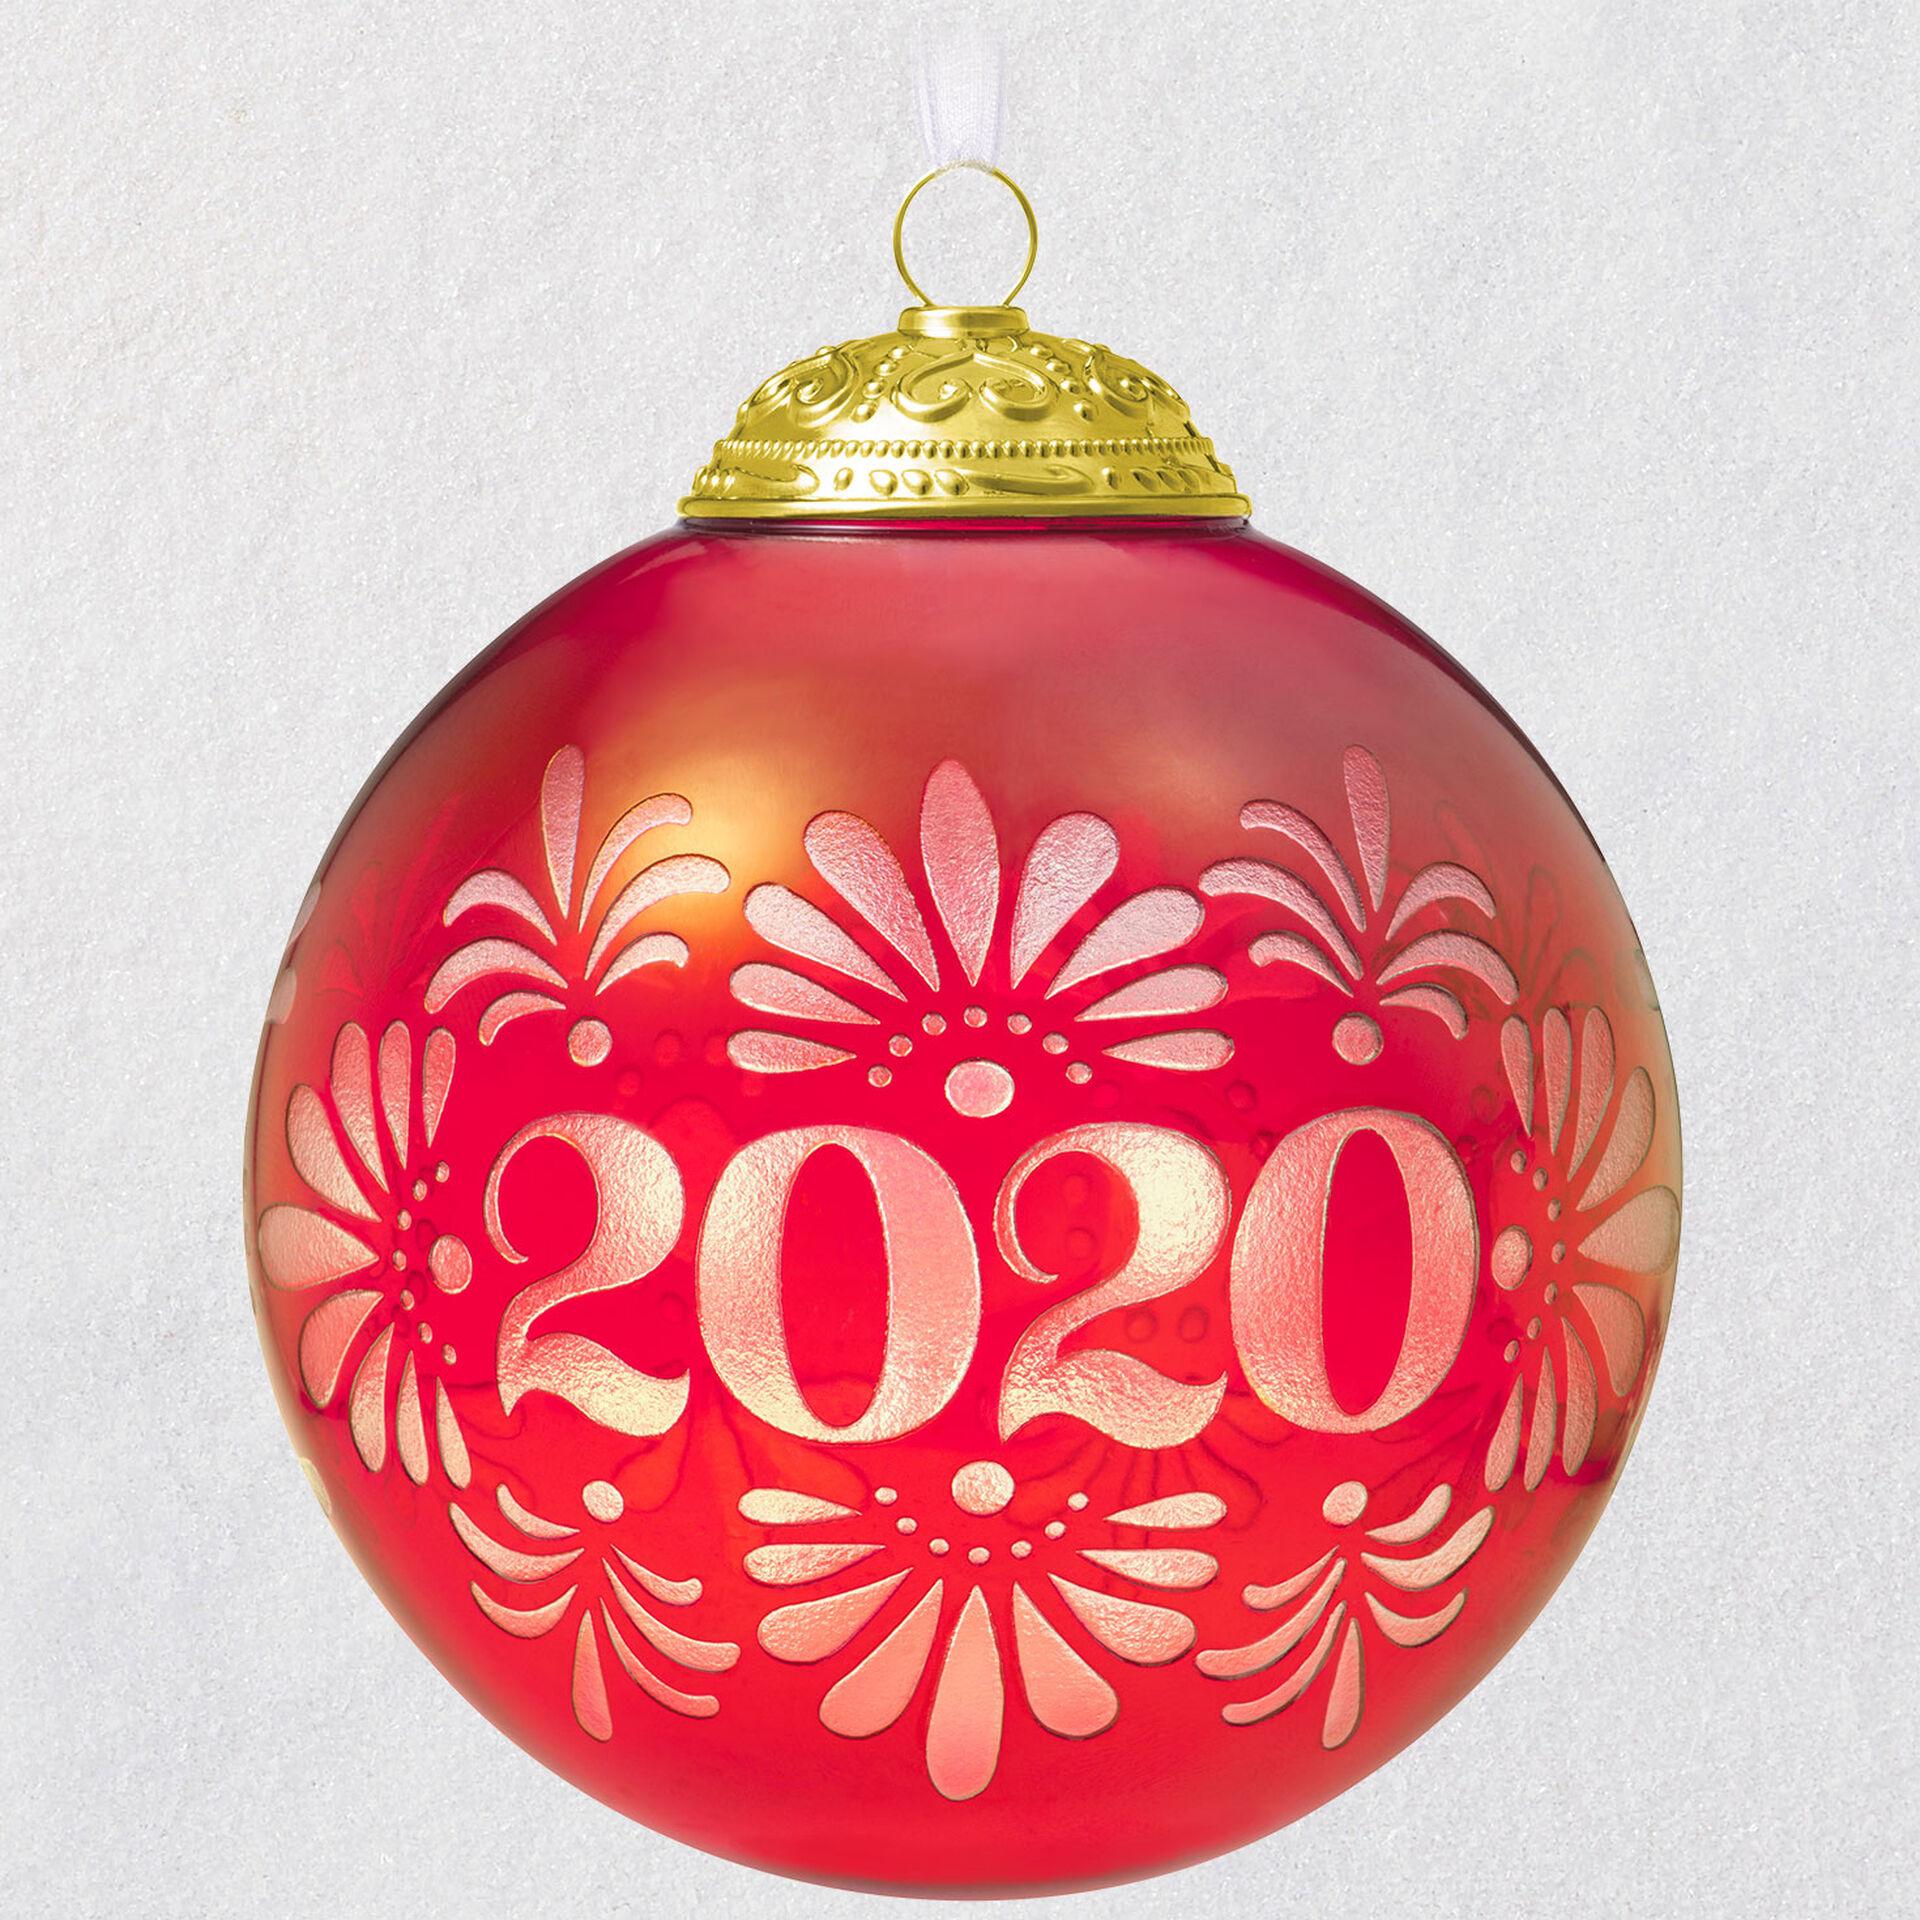 2020 christmas commemorative glass ball ornament keepsake ornaments hallmark 2020 christmas commemorative glass ball ornament